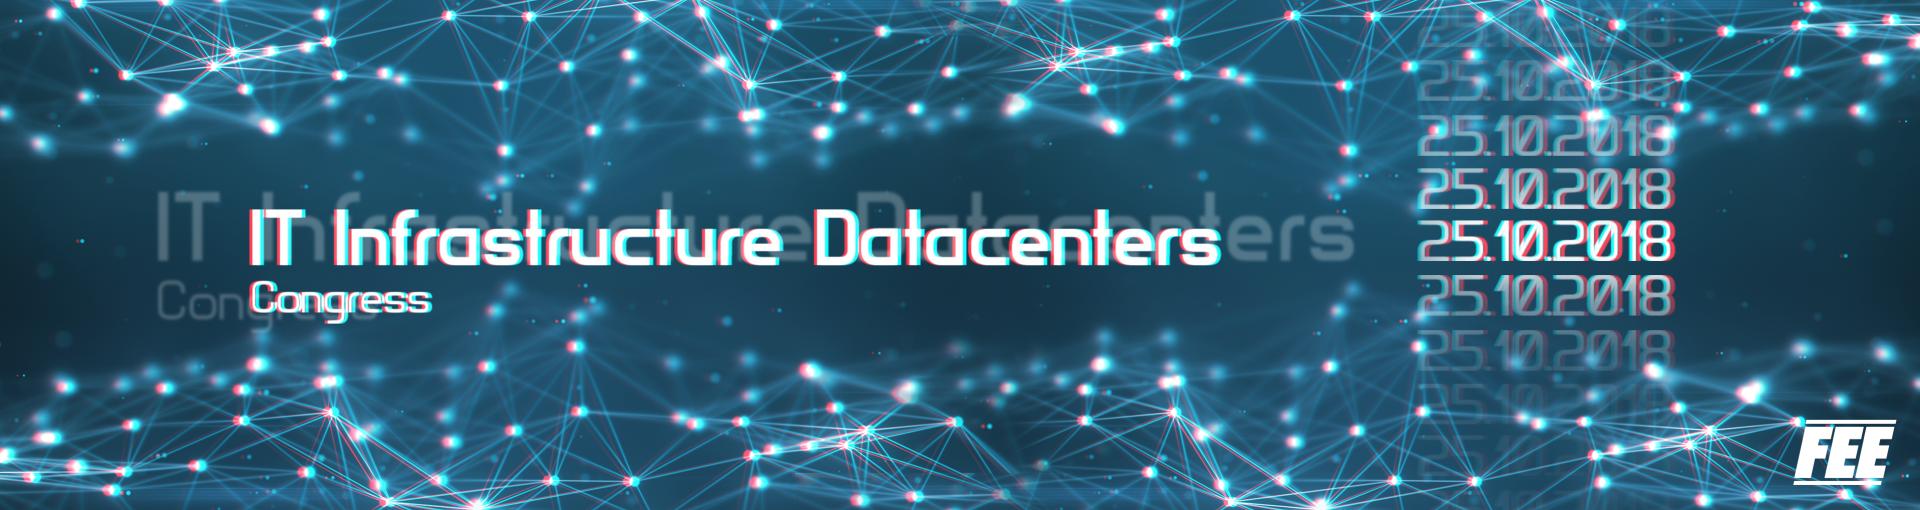 IT Infrastructure Datacenters Congress 2018